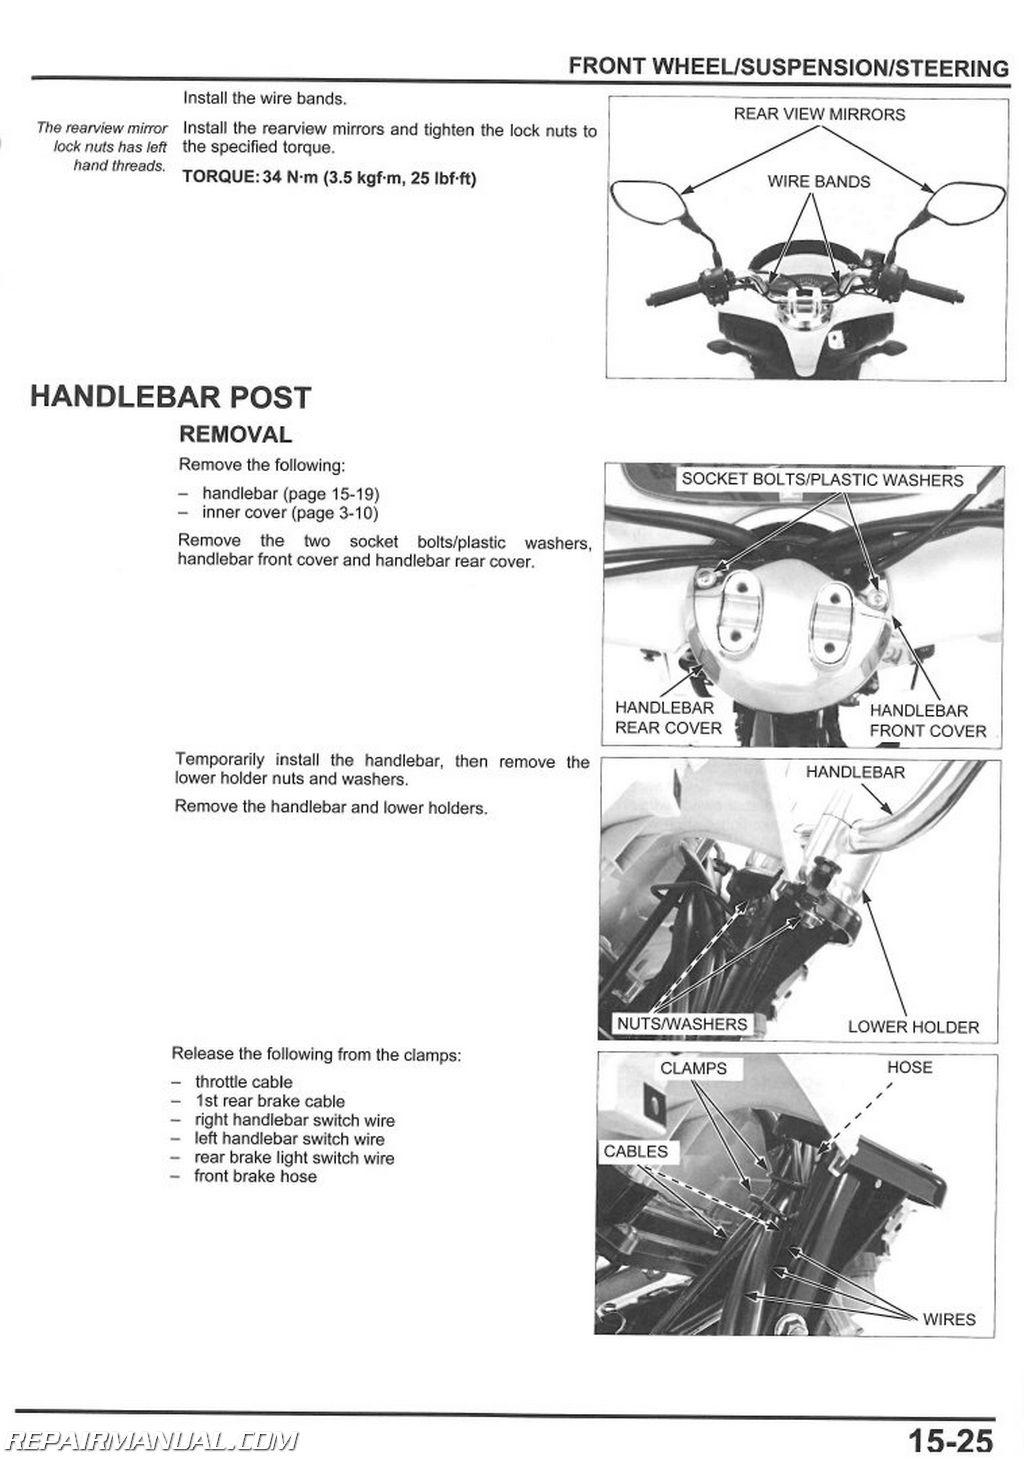 Honda Pcx125 Scooter Service Manual By Repairmanual